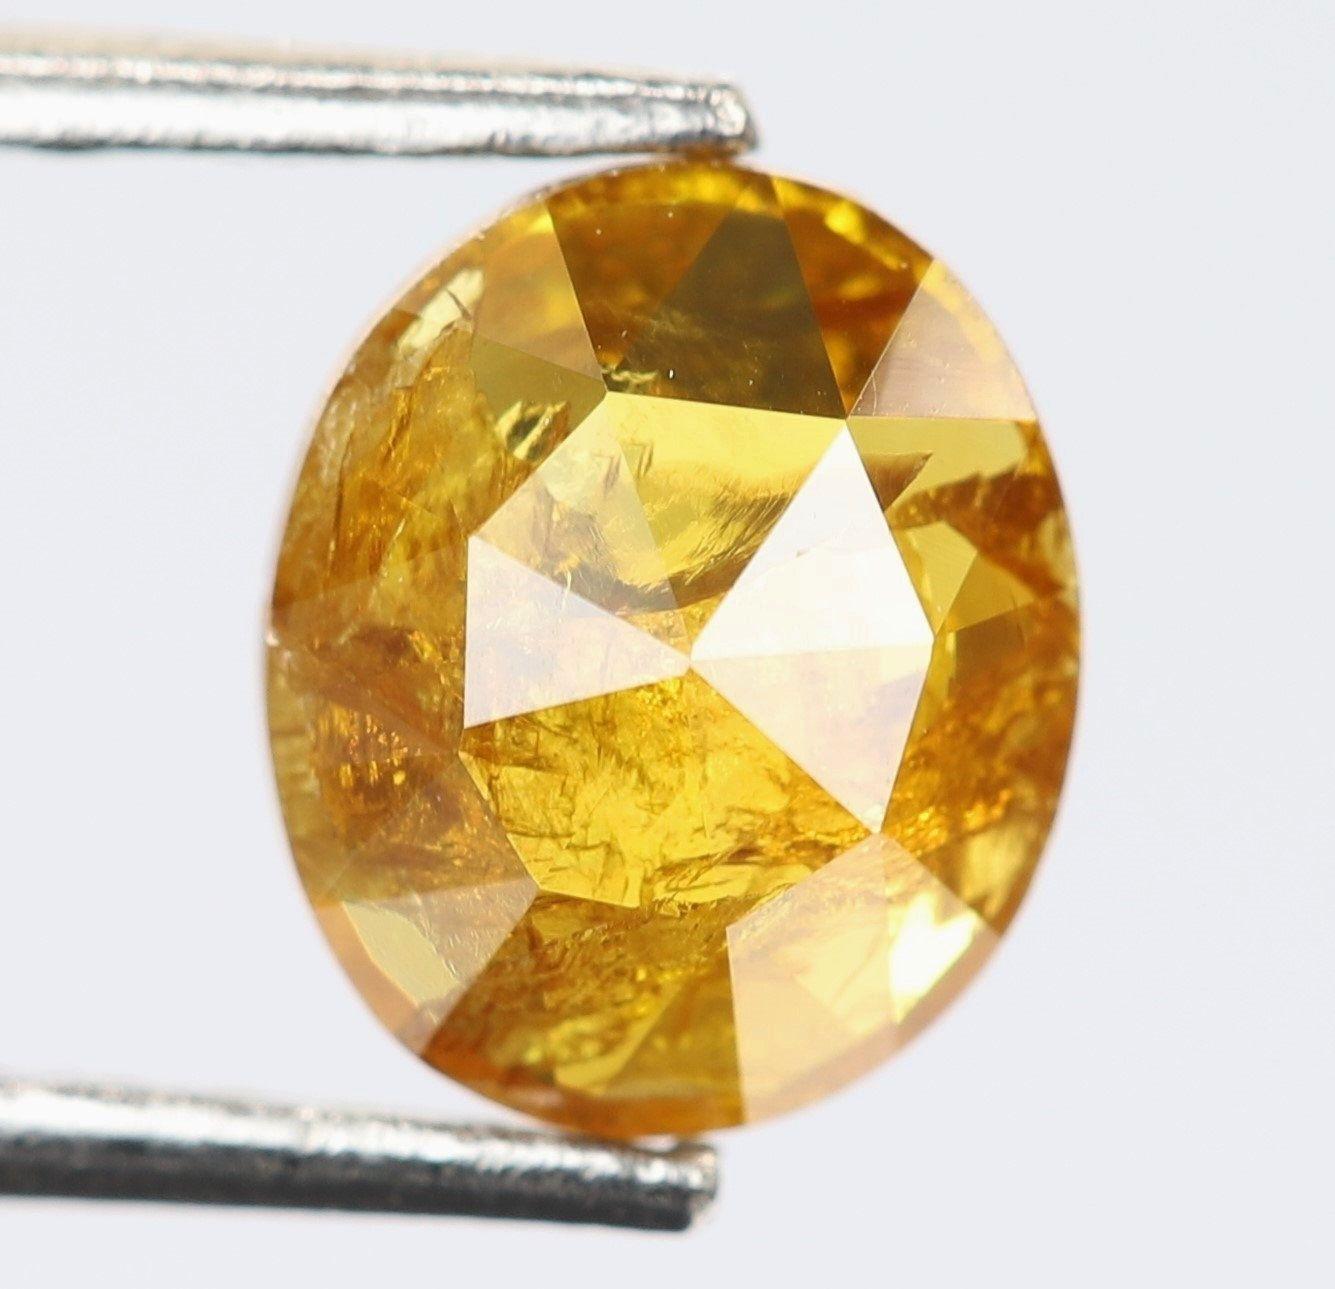 R1201 0.47 Ct Oval Shape Orange Color Natural Loose Beautiful Diamond Fancy Antique Diamond Jewelry 5.7 X 4.8 X 2.0 MM Pave Diamond